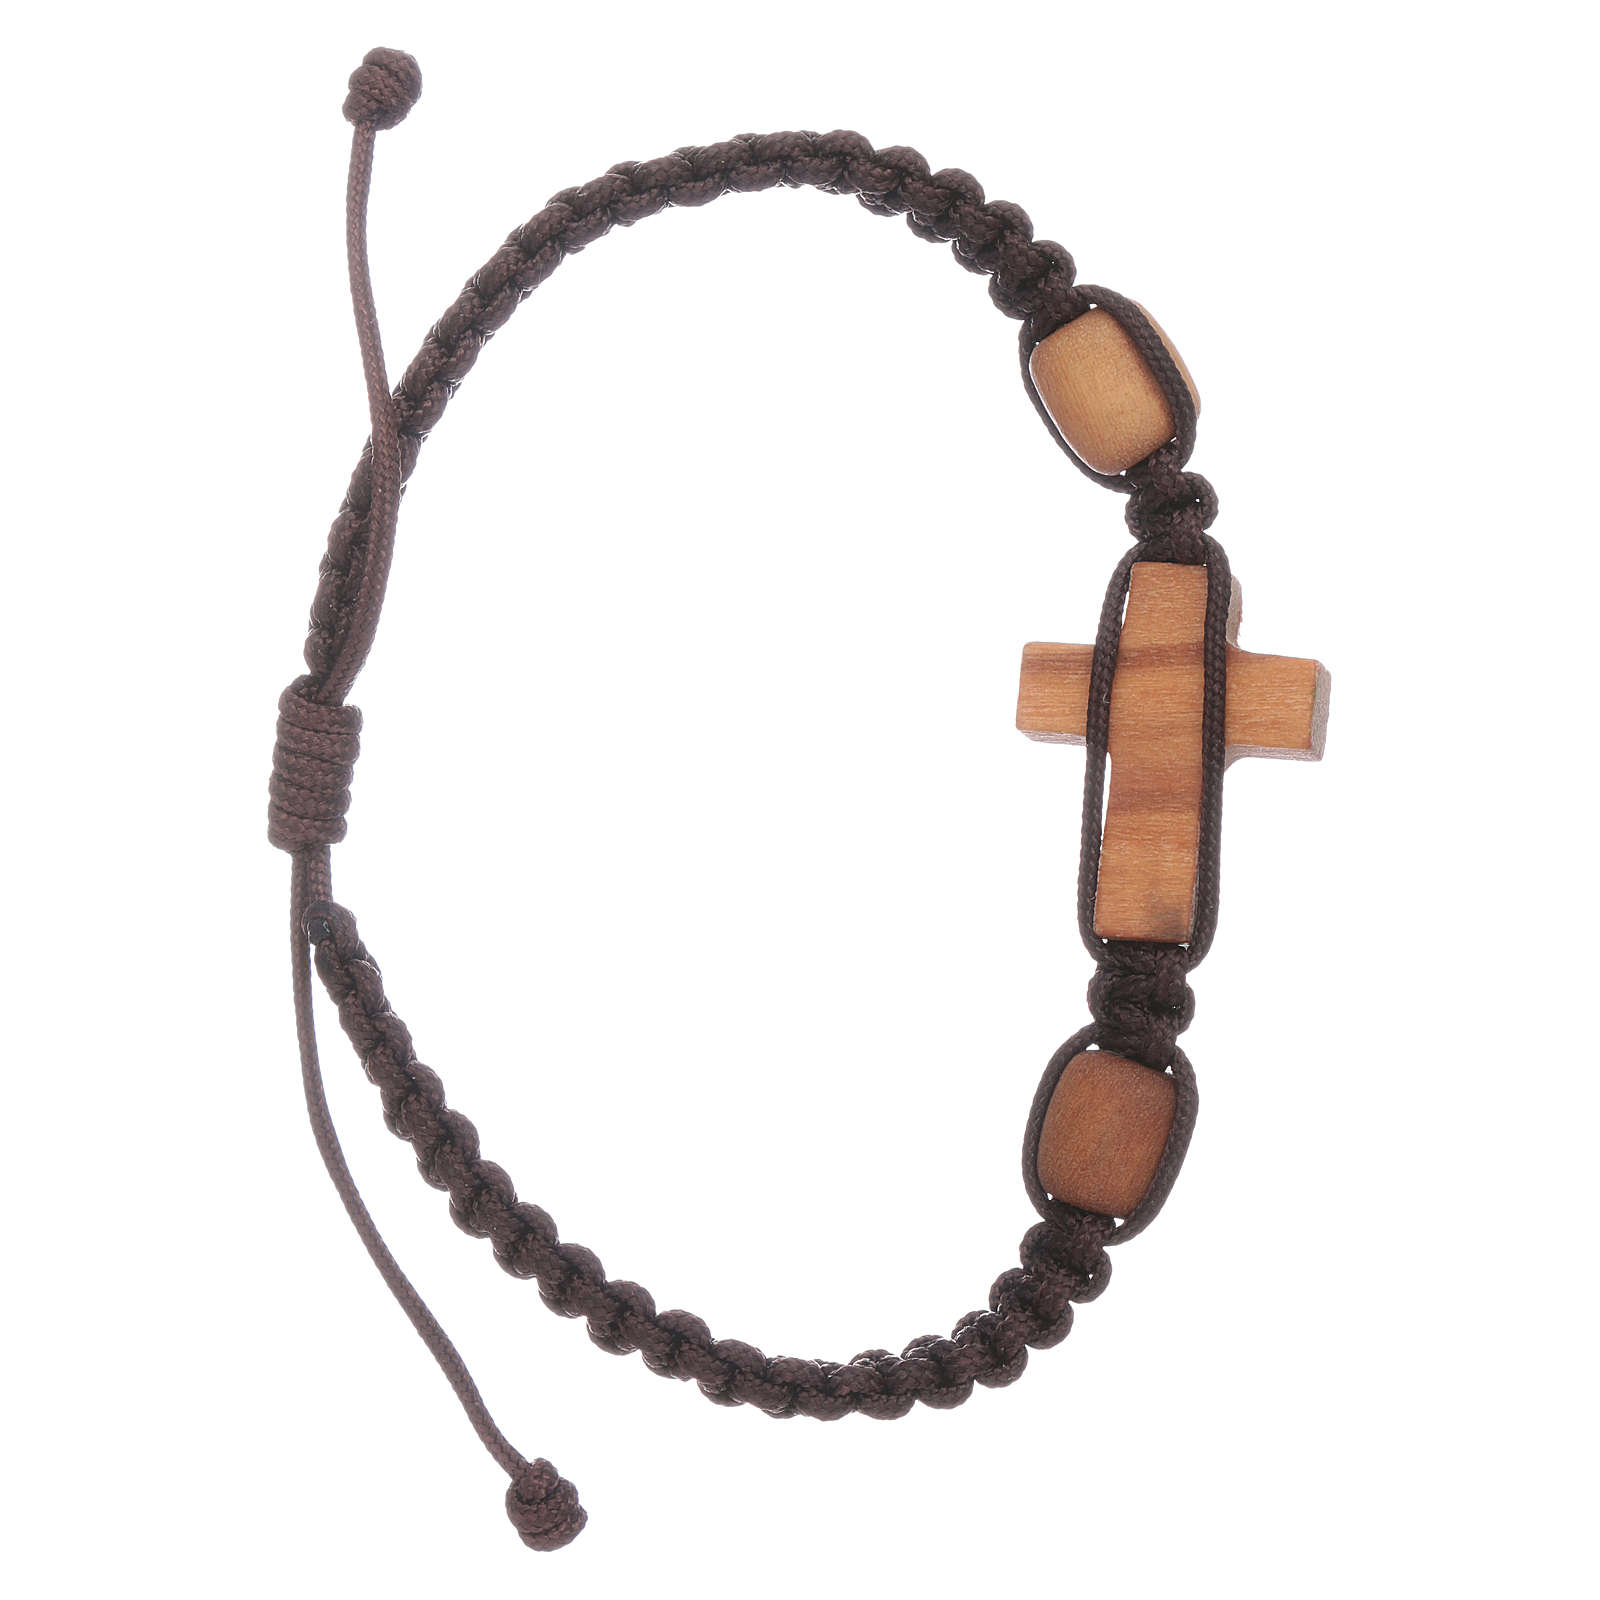 Bracciale Medjugorje croce e grani in ulivo corda marrone 4